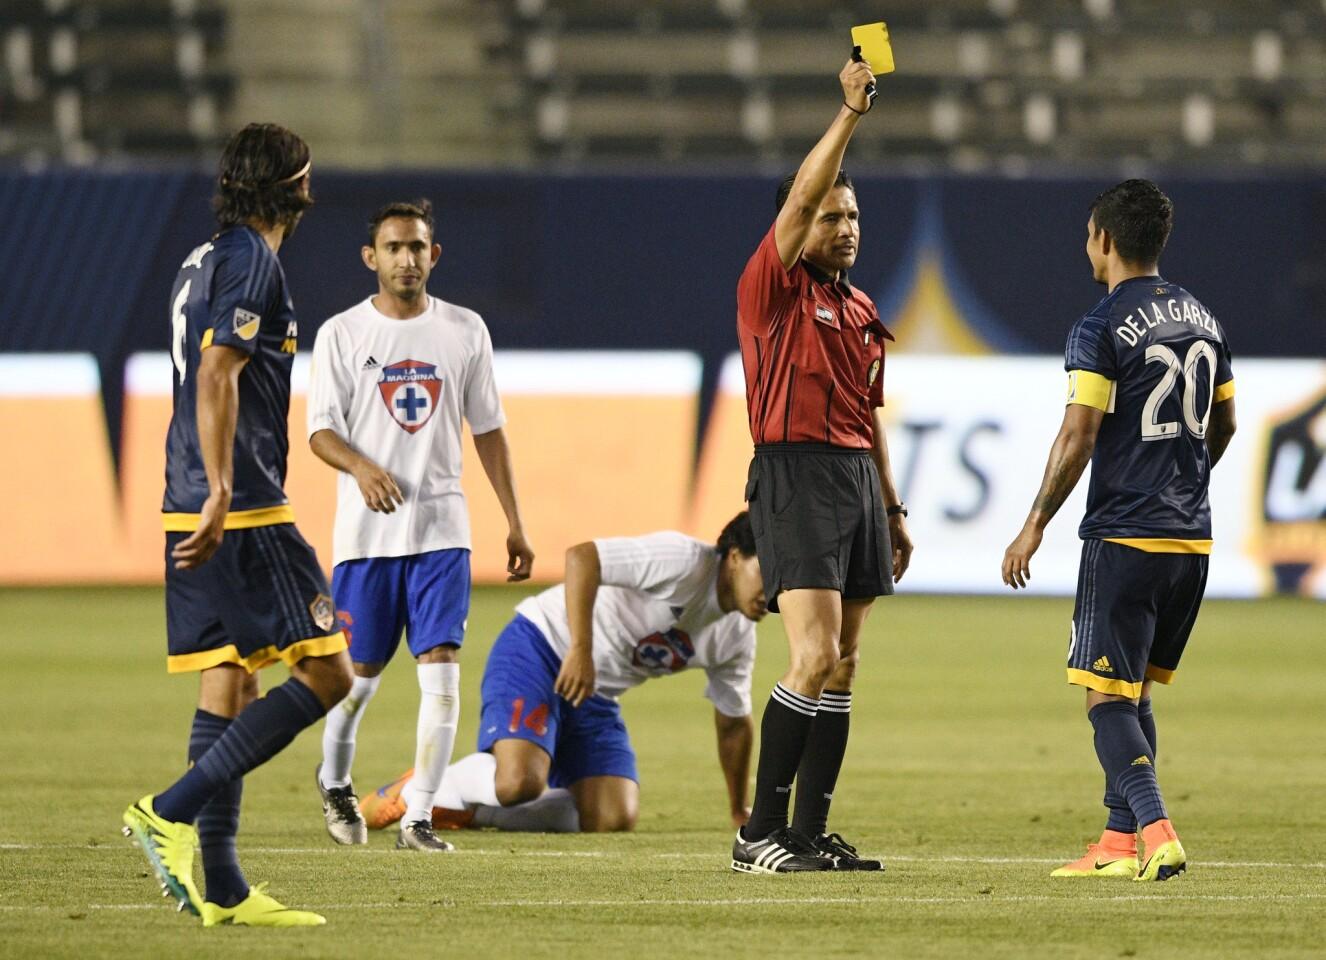 Jun 14, 2016; Los Angeles, CA, USA; Referee Ramon Hernandez gives LA Galaxy defender A.J. DeLaGarza (20) a yellow card during the second half against La Maquina at StubHub Center. The LA Galaxy won 4-1. Mandatory Credit: Kelvin Kuo-USA TODAY Sports ** Usable by SD ONLY **